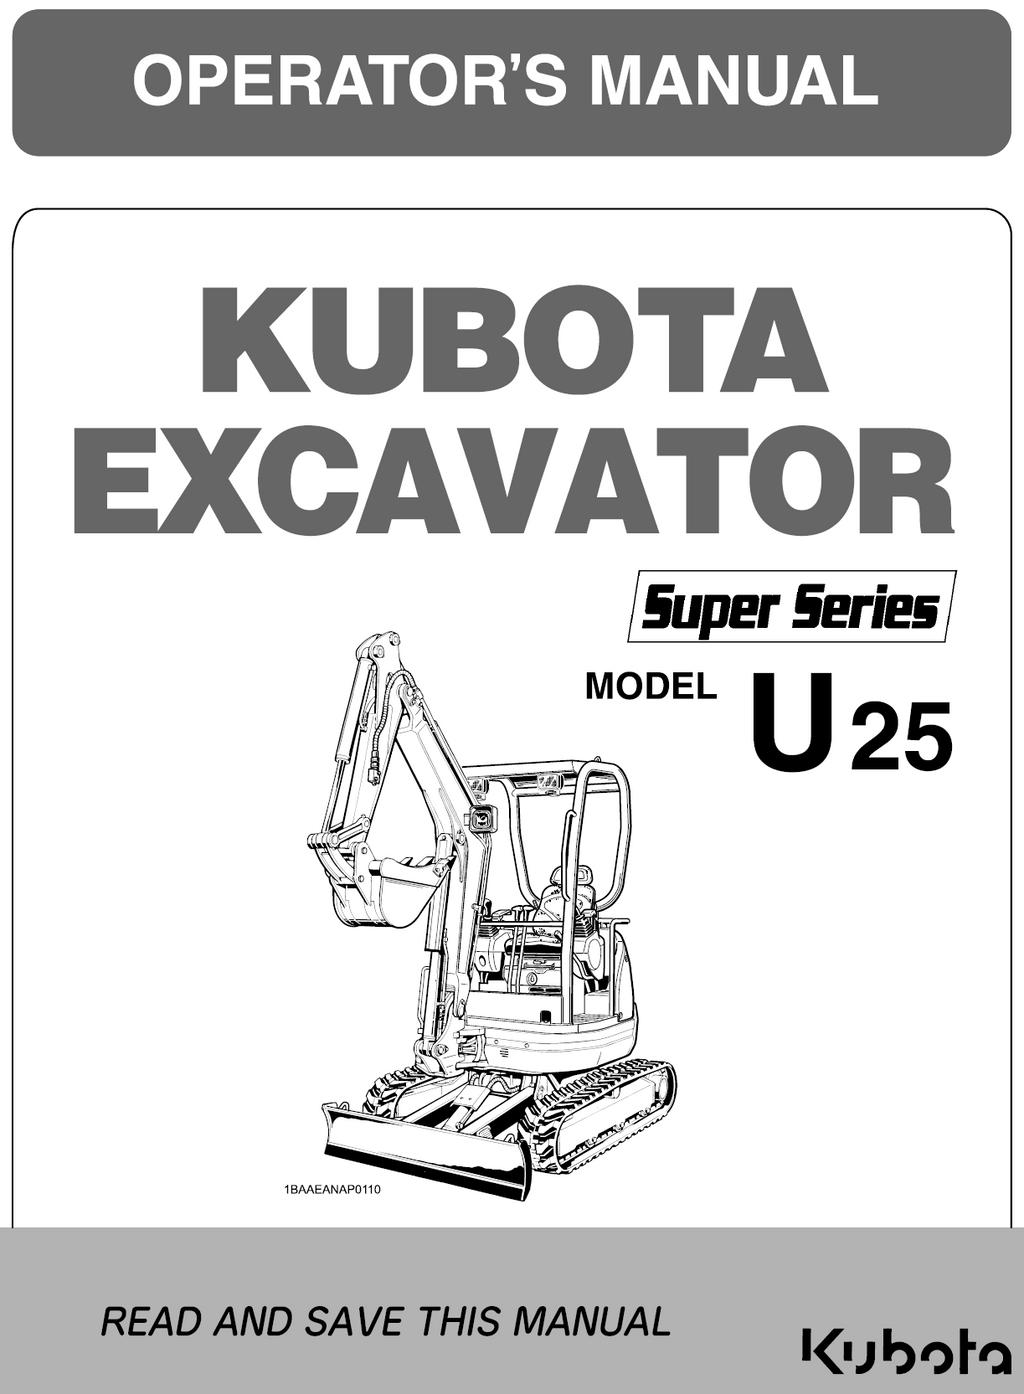 [CSDW_4250]   Kubota U25 - Super Series Operator's Manual | Kubota Excavator Wiring Diagrams |  | Garton Tractor